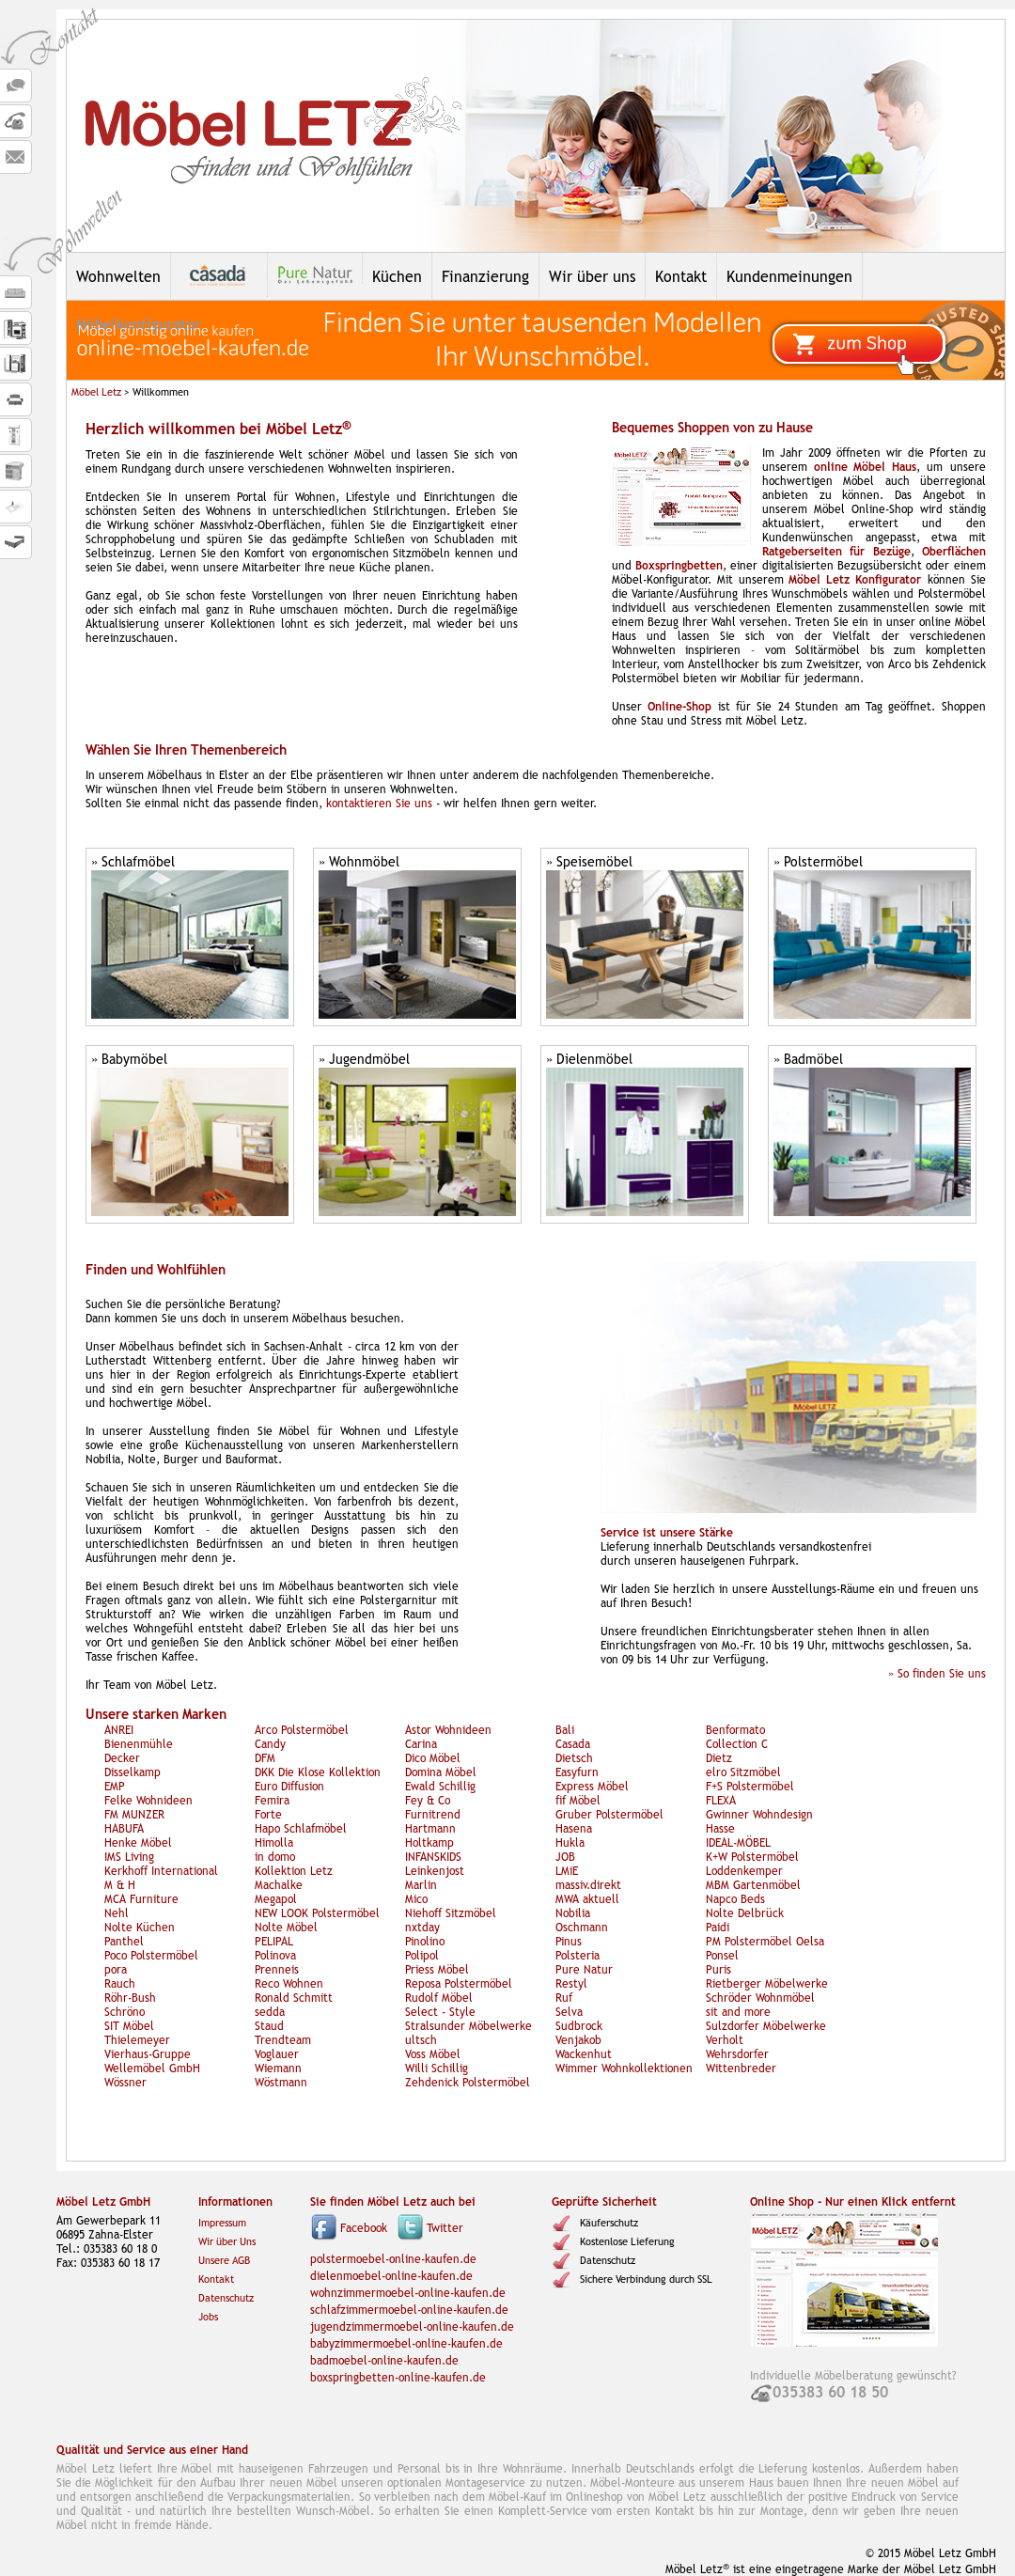 Moebel Letz Competitors, Revenue And Employees   Owler Company Profile